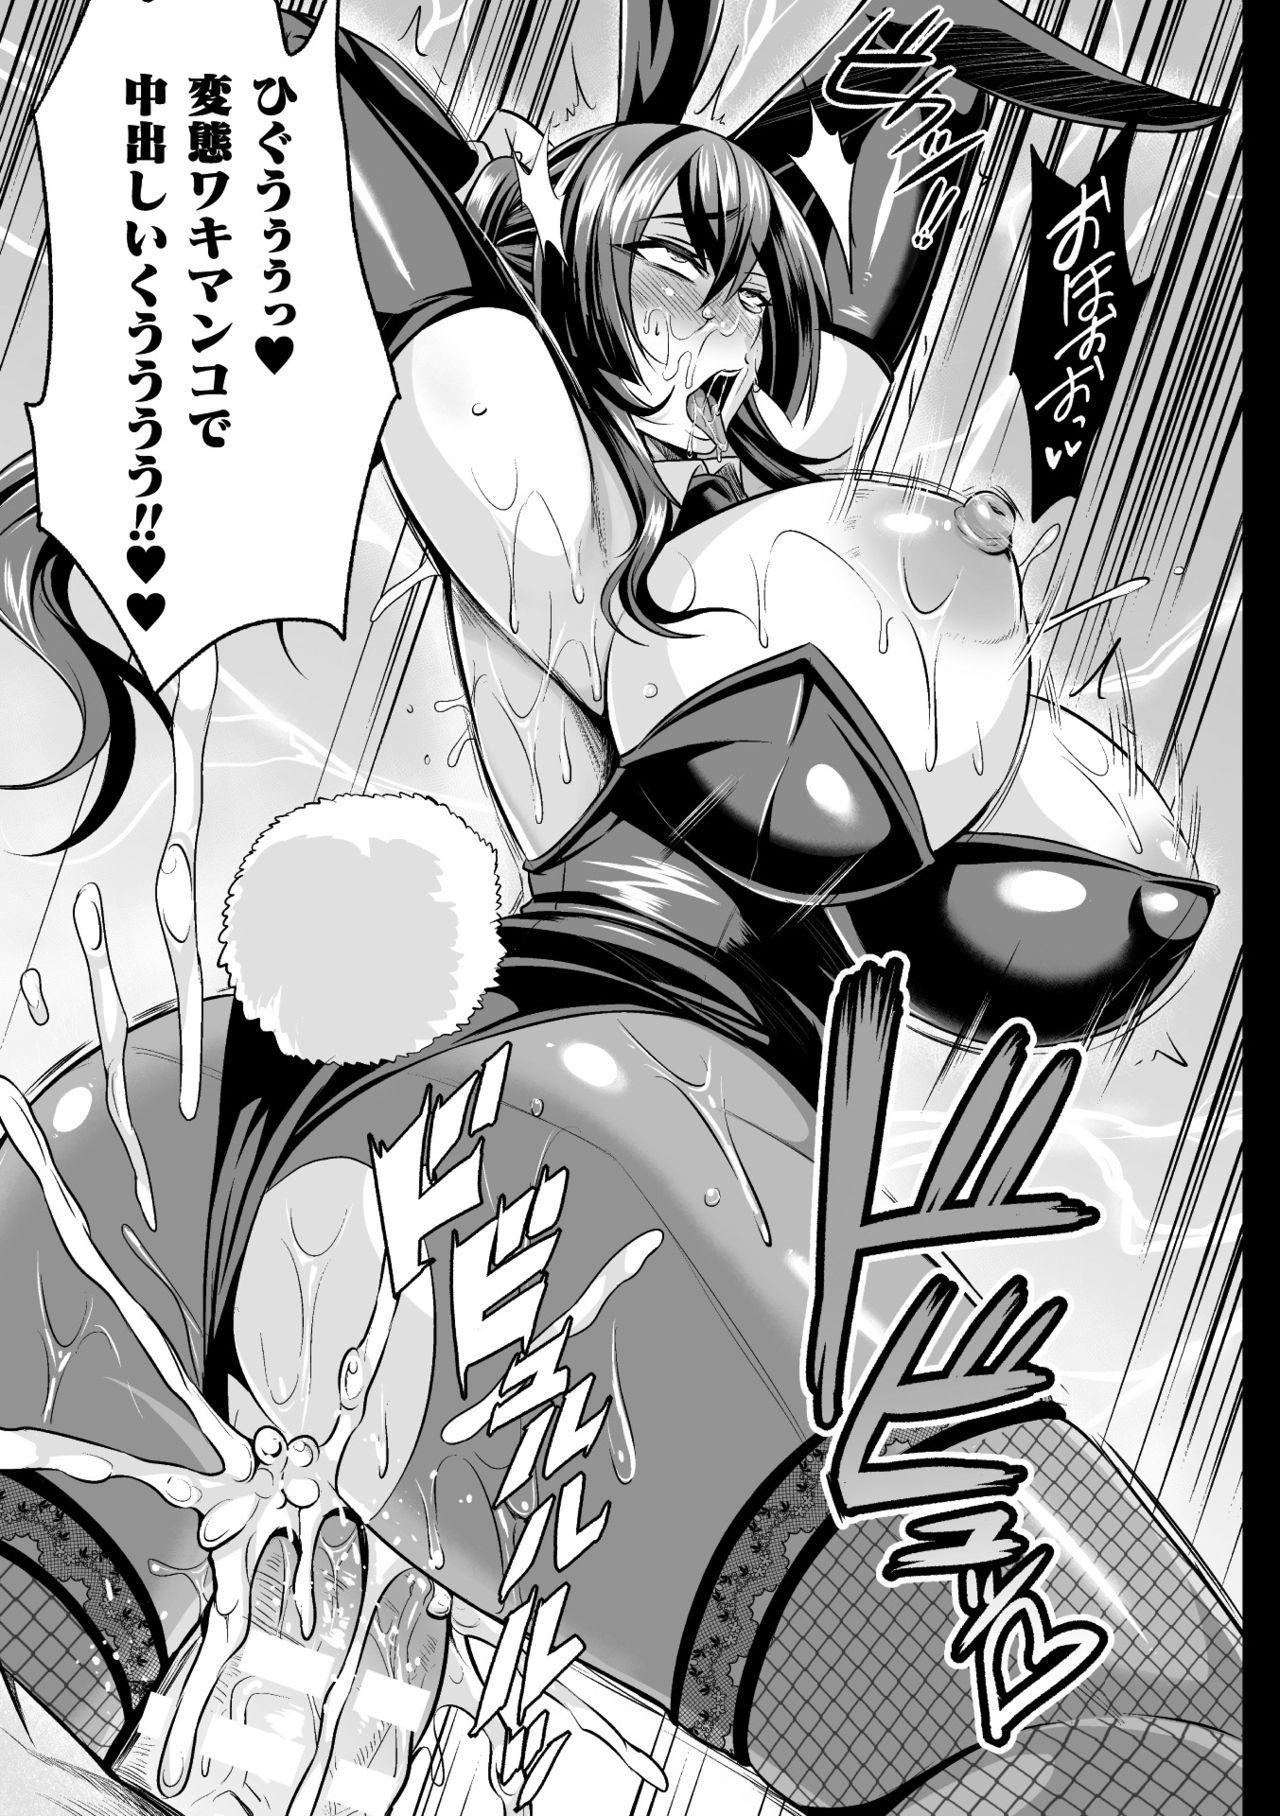 2D Comic Magazine Waki Feti Bunny Girl Vol. 1 44